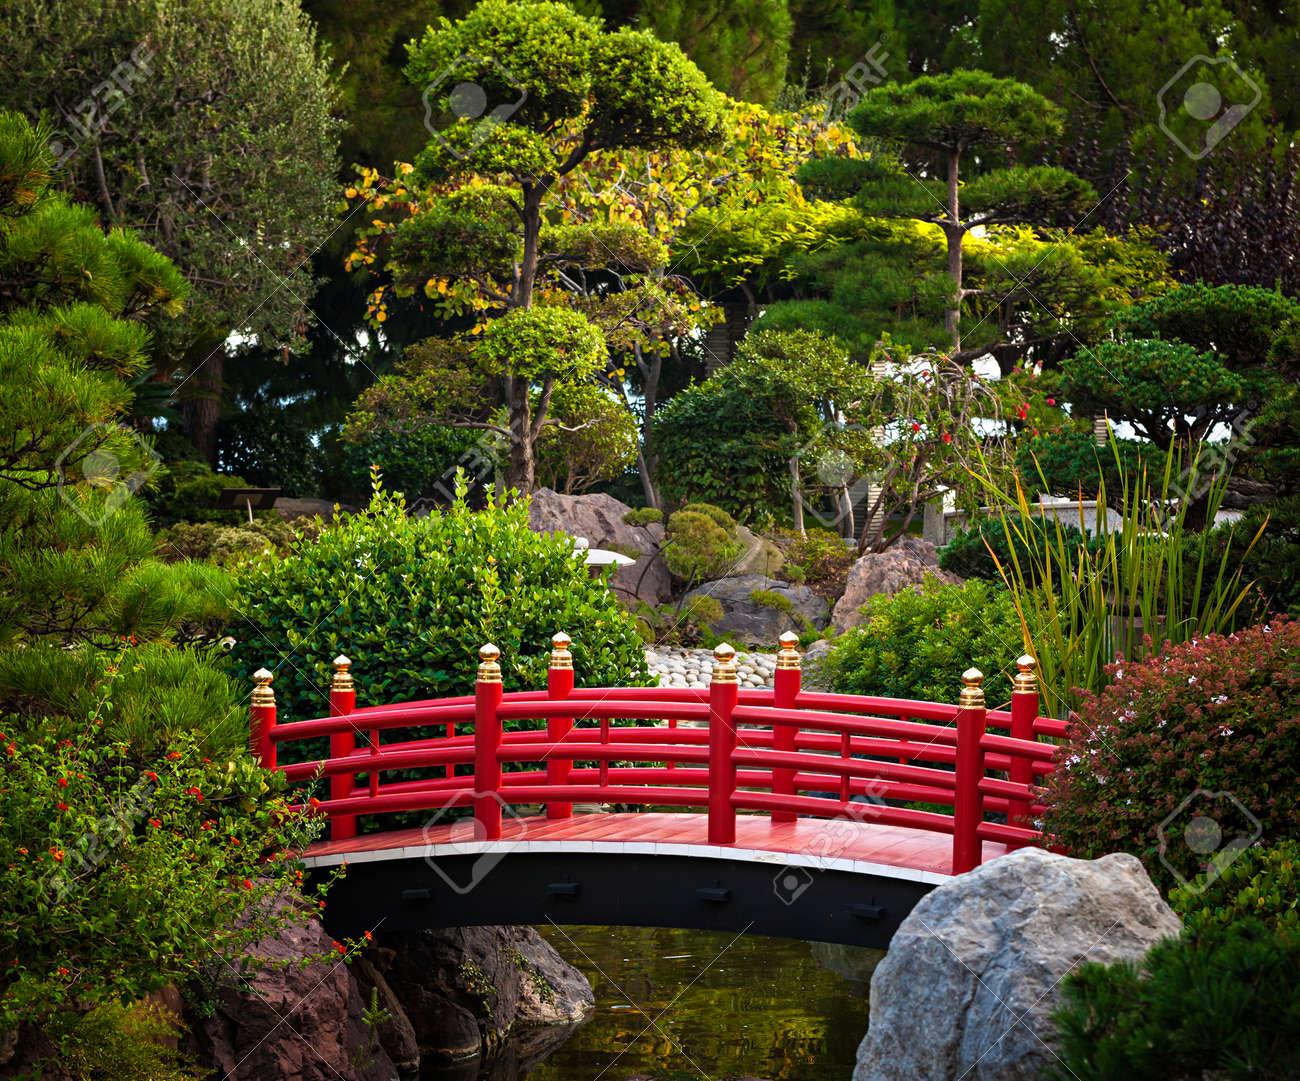 Red bridge over pond in Japanese garden. Monte Carlo, Monaco. - 39234708